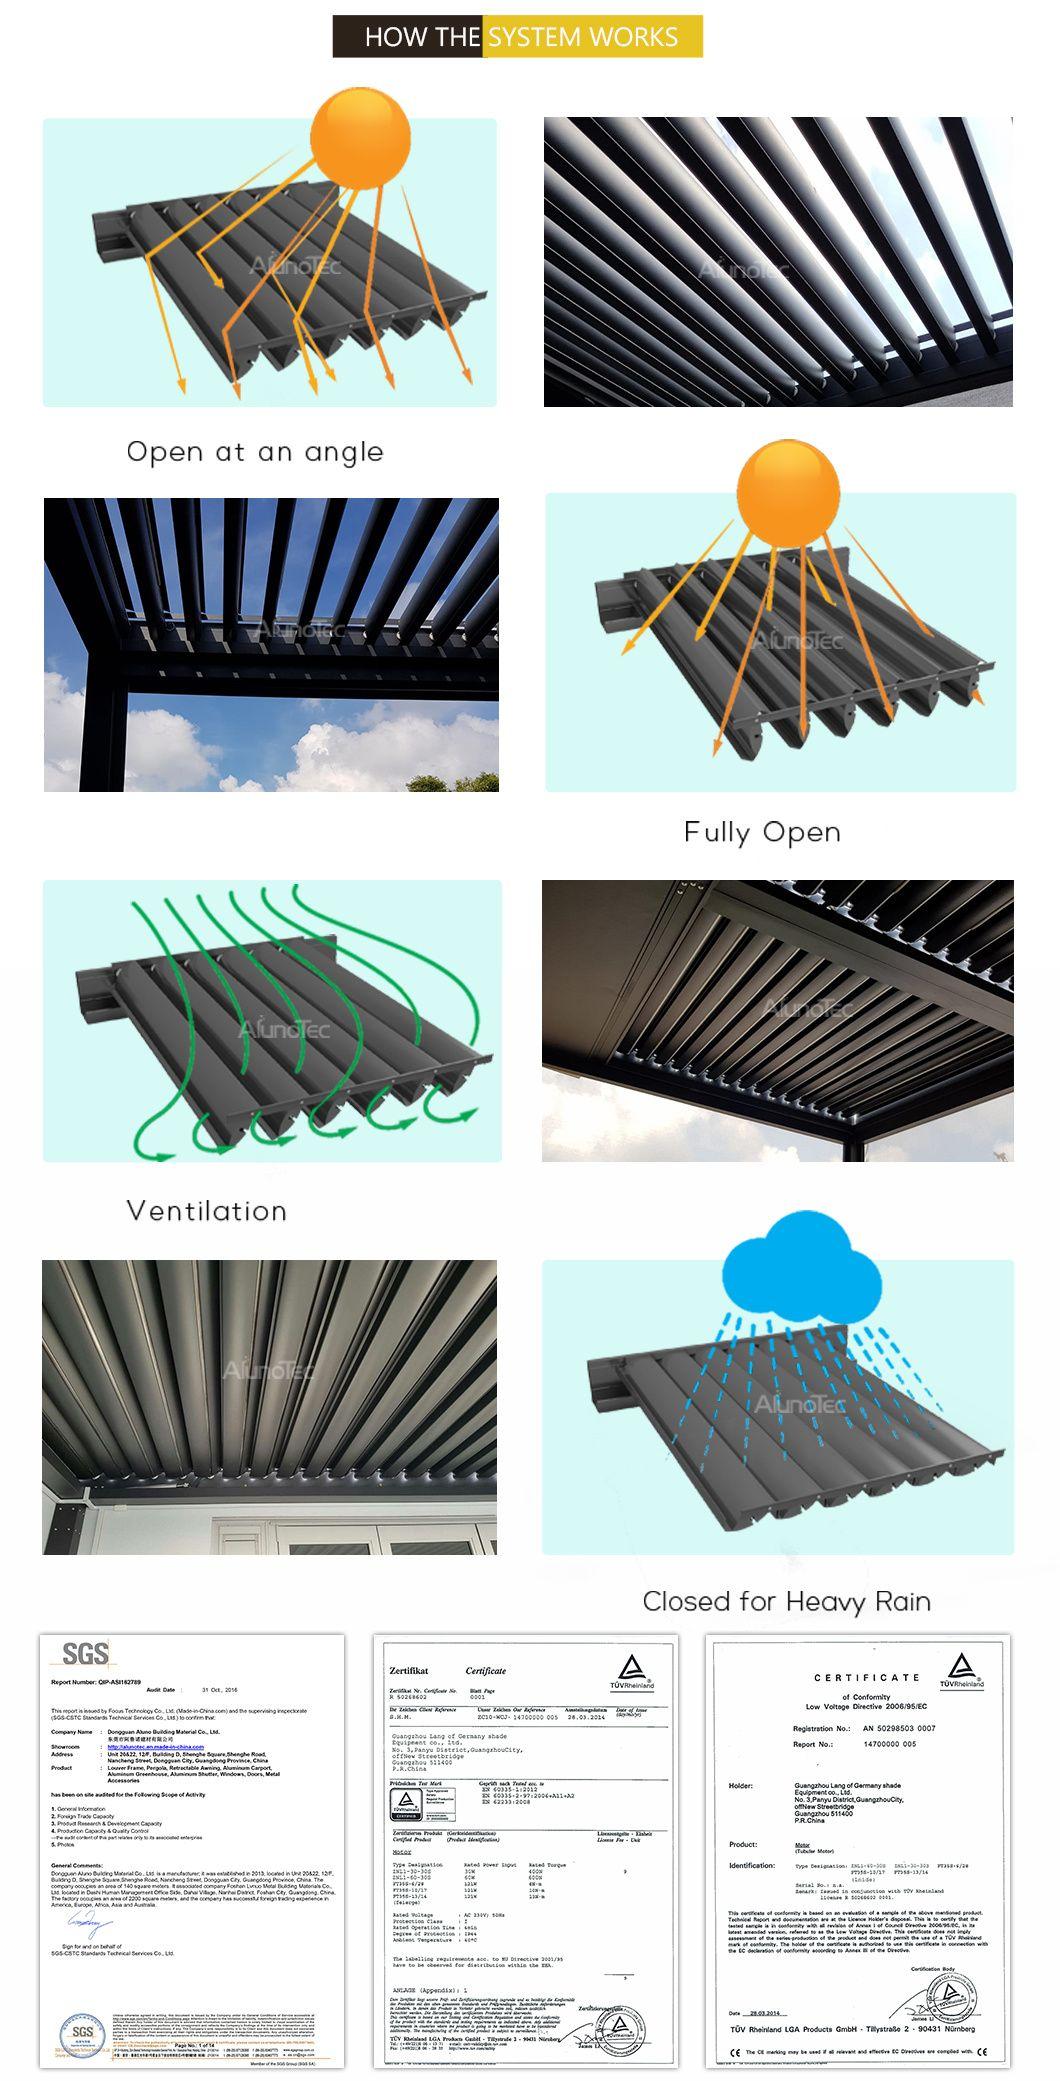 Hot Item Motorised Louvre Canopy Motorized Pergola Louvers Roof Kits In 2020 Louvered Pergola Pergola Pergola Patio